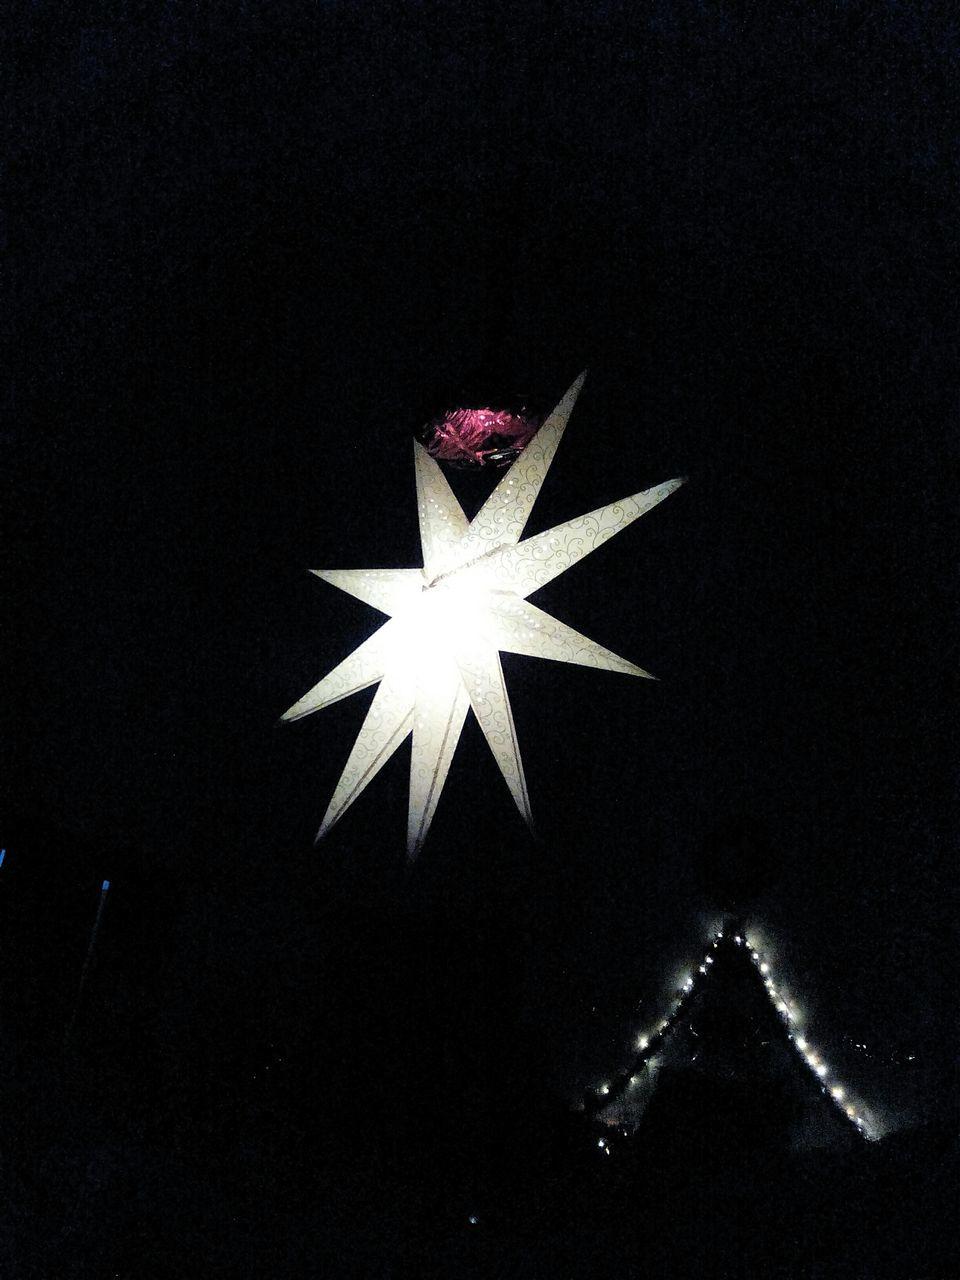 christmas, christmas decoration, celebration, indoors, black background, night, no people, close-up, studio shot, christmas ornament